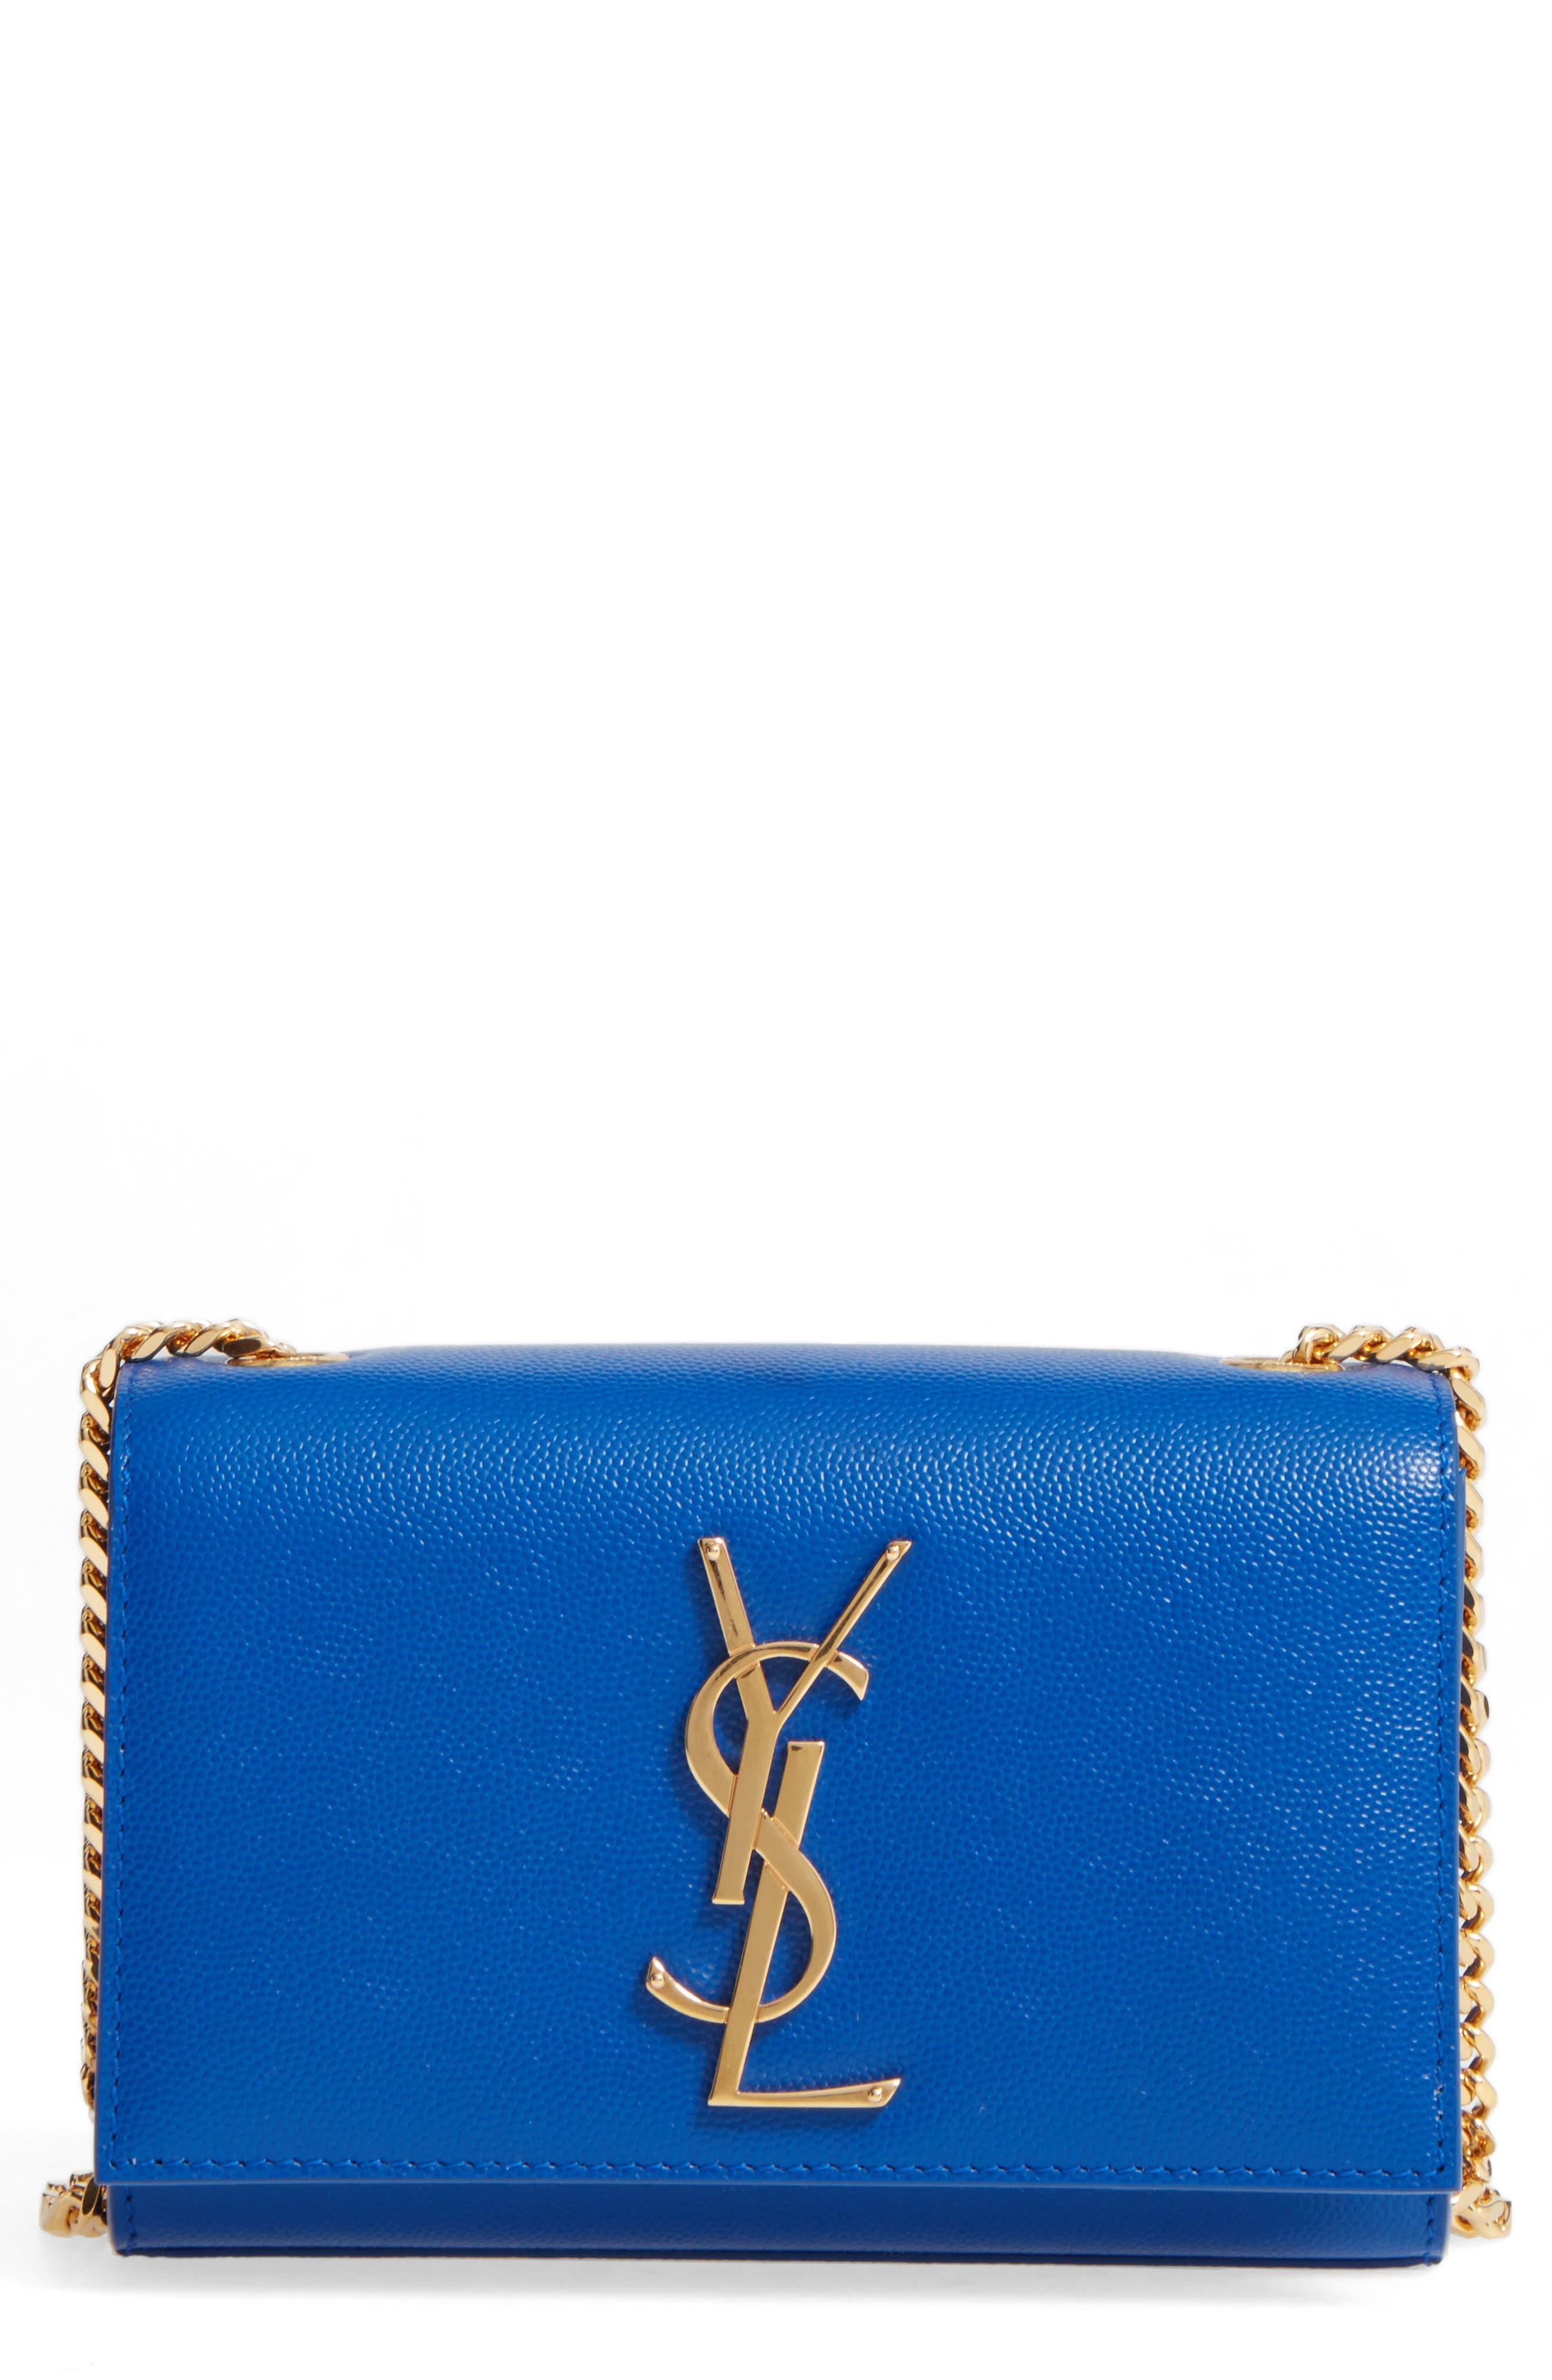 Main Image - Saint Laurent 'Small Monogram' Crossbody Bag